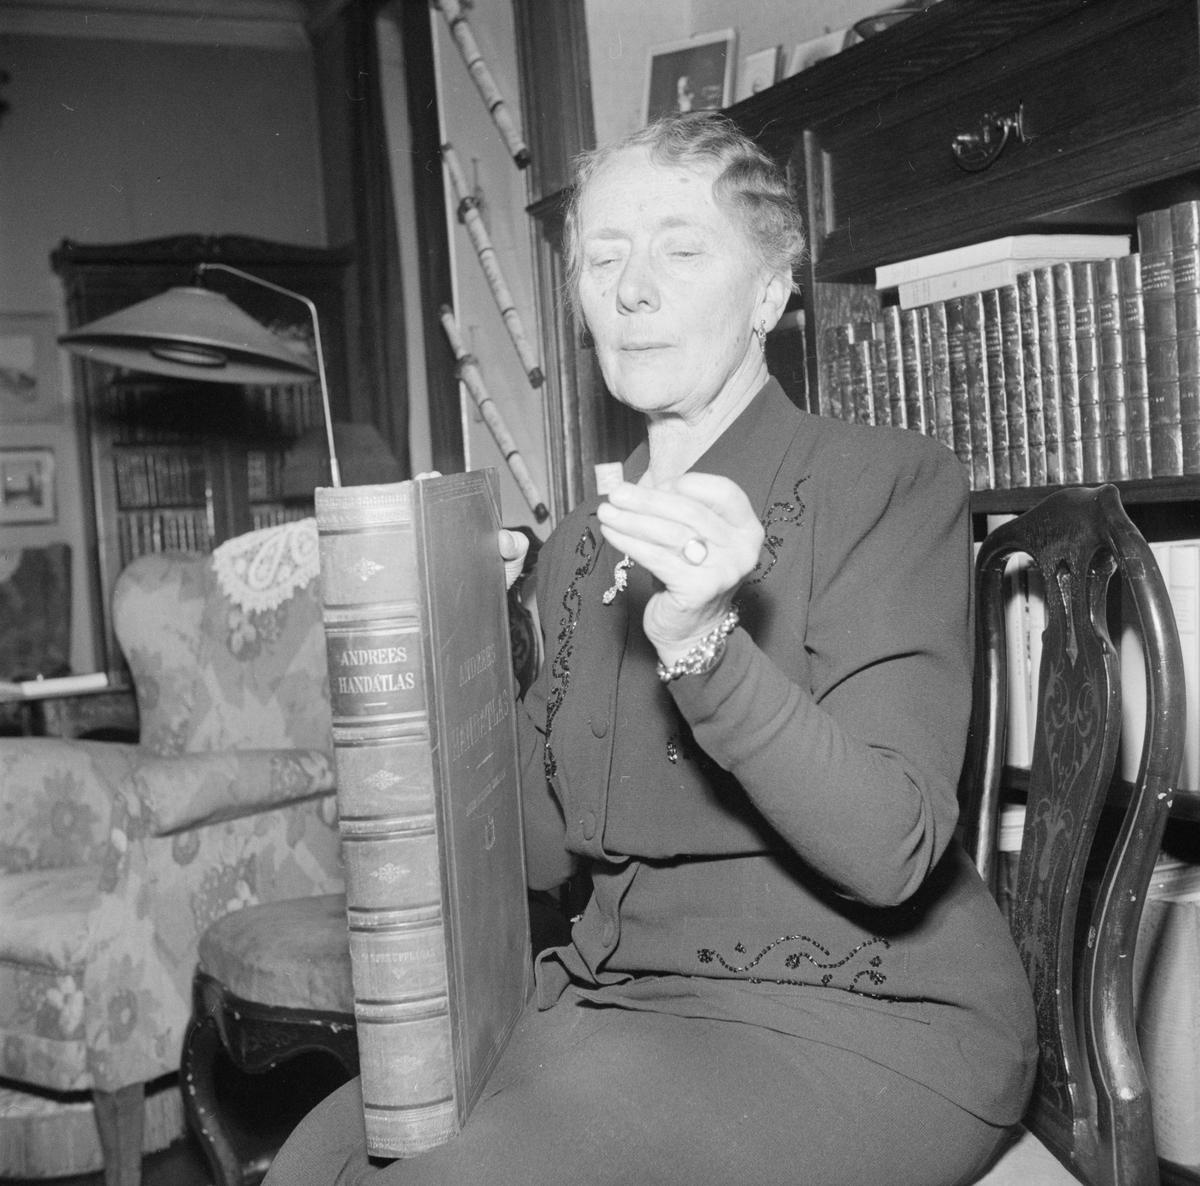 Reportage i Medborgaren, Sala, Västmanland 1949